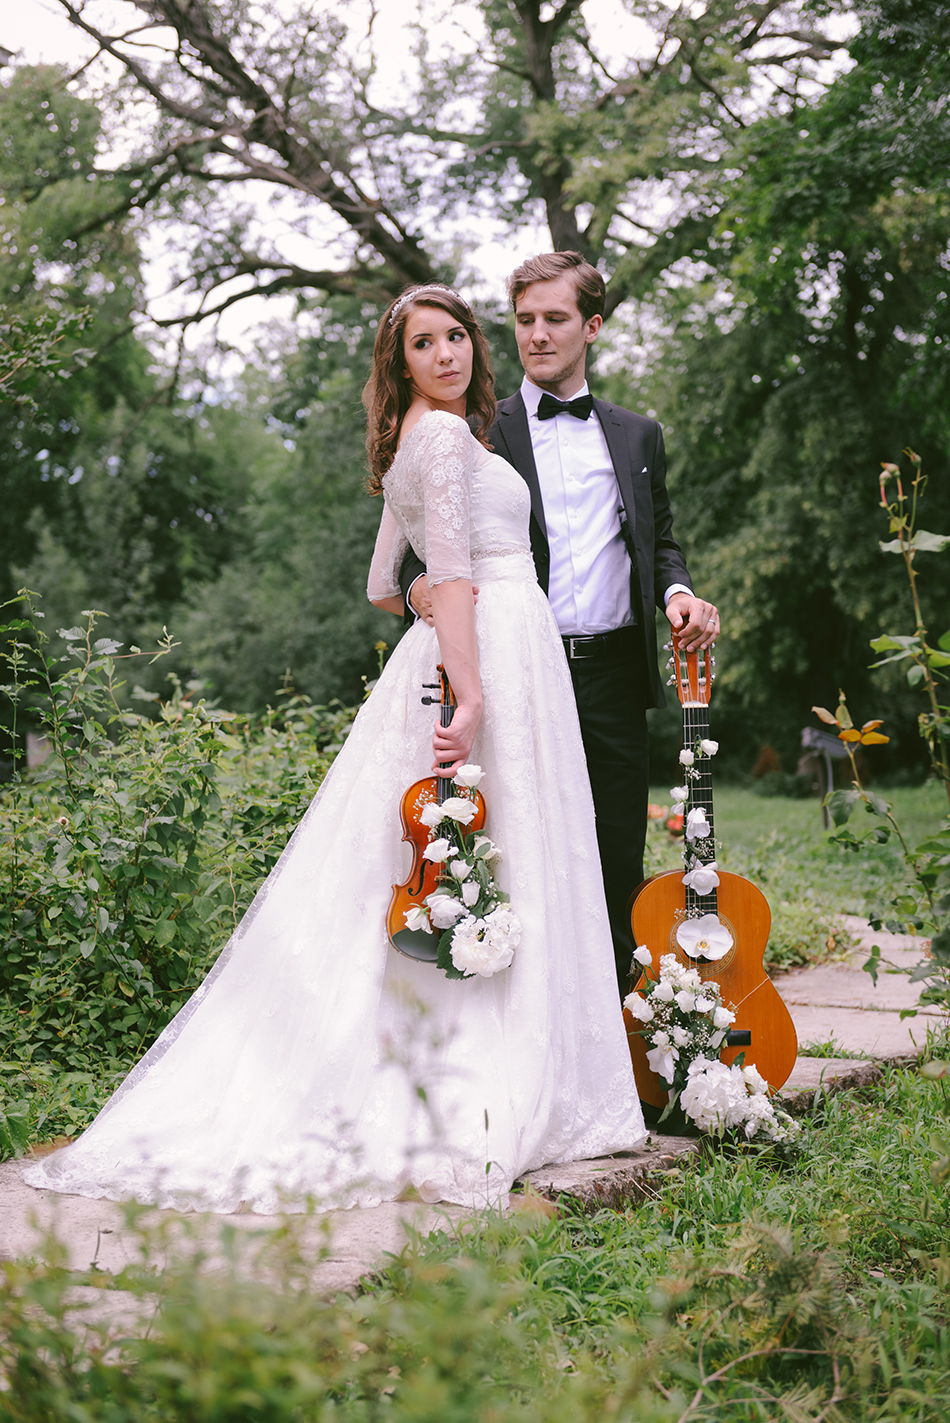 AD Passion Photography | sami-ela-lela-nunta-domeniu-lupas-arad_0047 | Adelin, Dida, fotograf profesionist, fotograf de nunta, fotografie de nunta, fotograf Timisoara, fotograf Craiova, fotograf Bucuresti, fotograf Arad, nunta Timisoara, nunta Arad, nunta Bucuresti, nunta Craiova